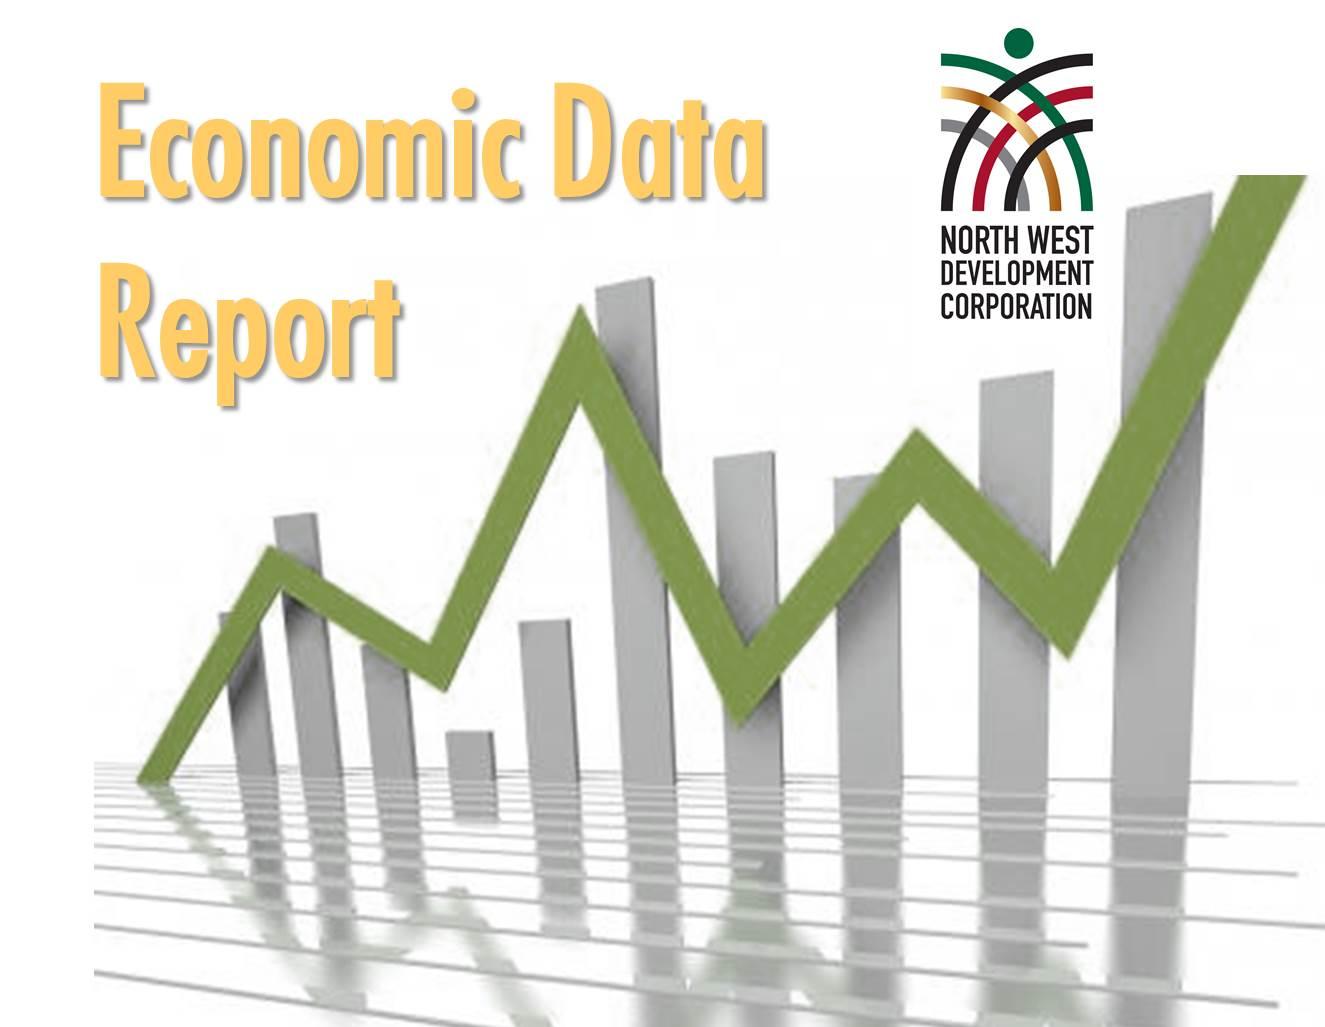 Economic data report image